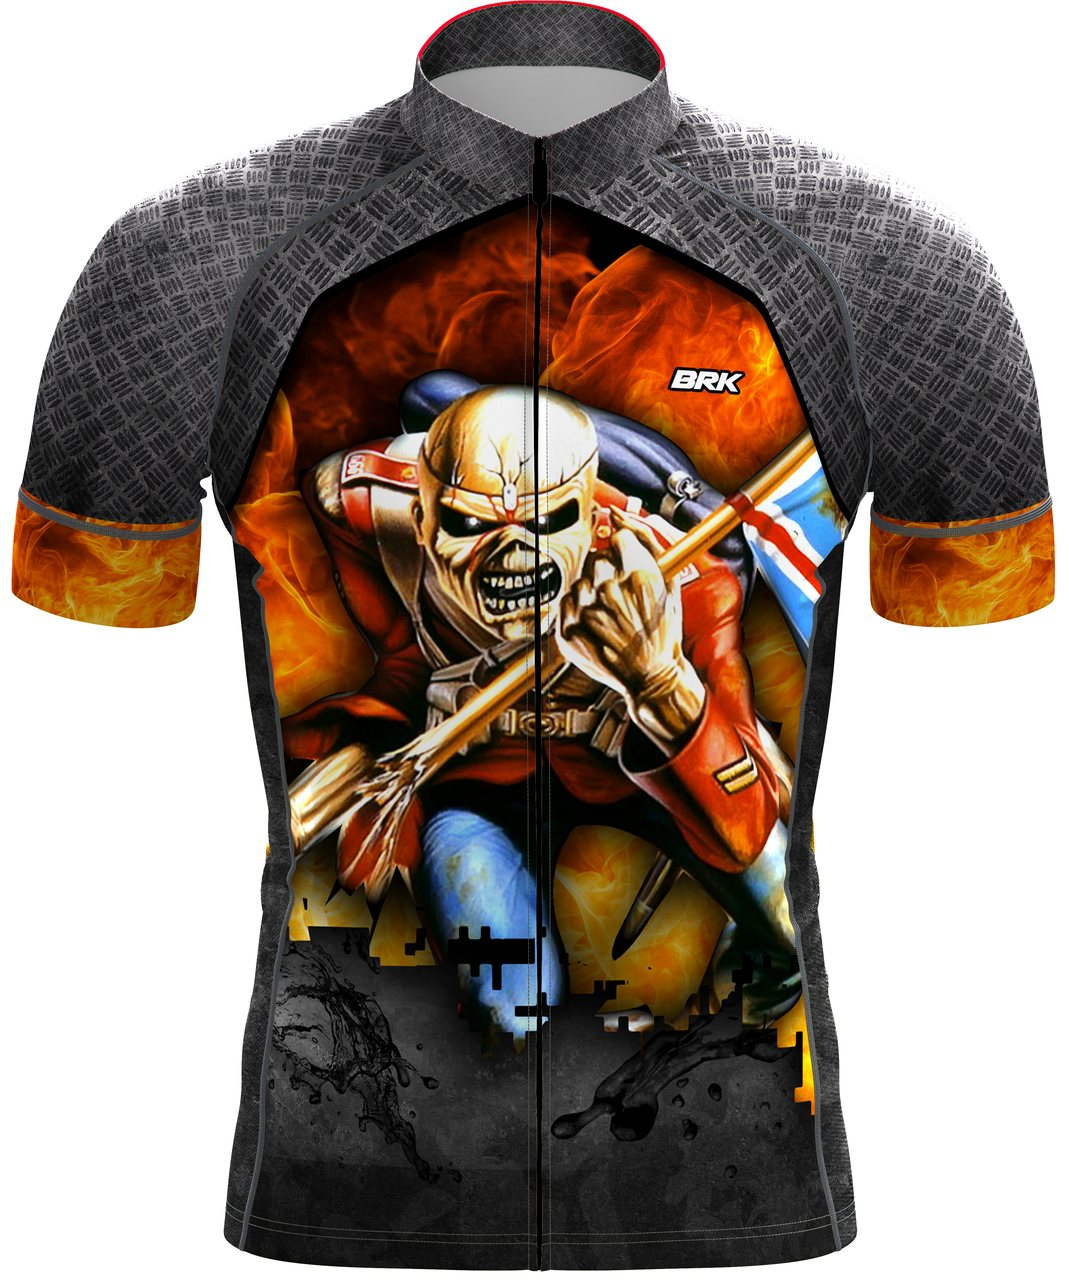 Camisa  Ciclismo Brk Iron Maiden com FPU 50+